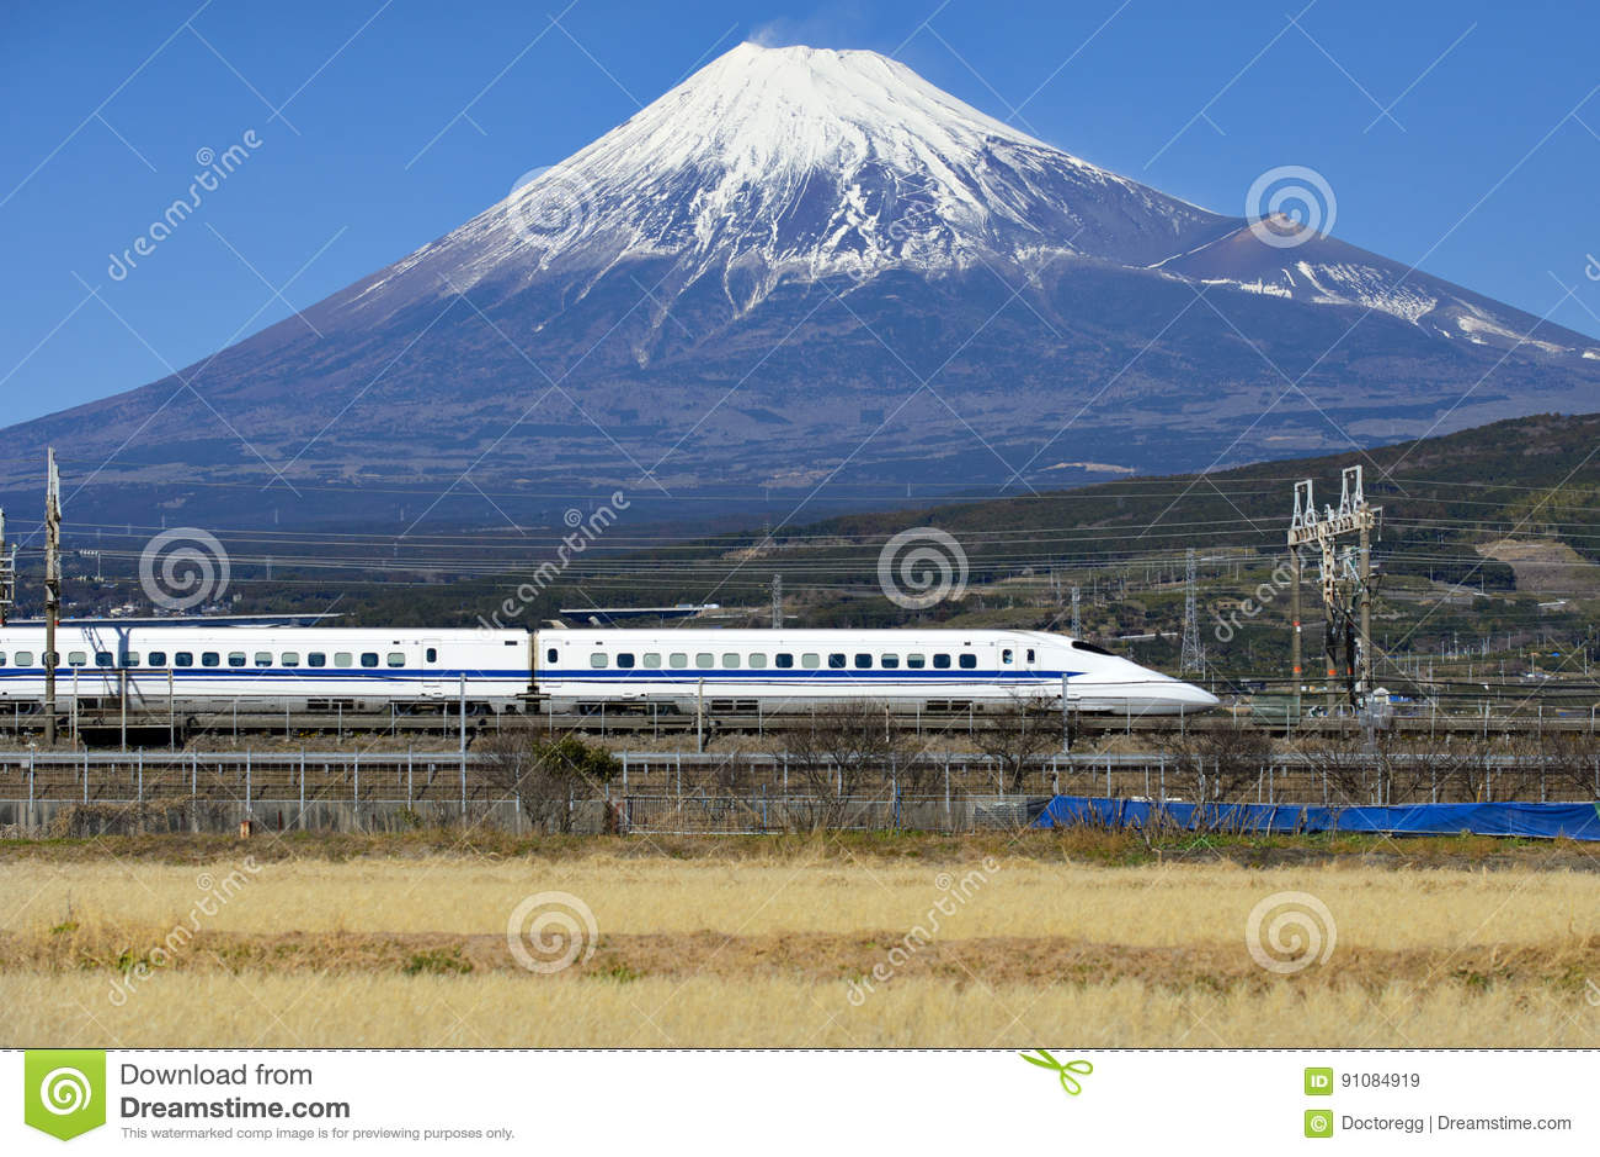 Fuji Mountain And Shinkansen Bullet Train Stock Image